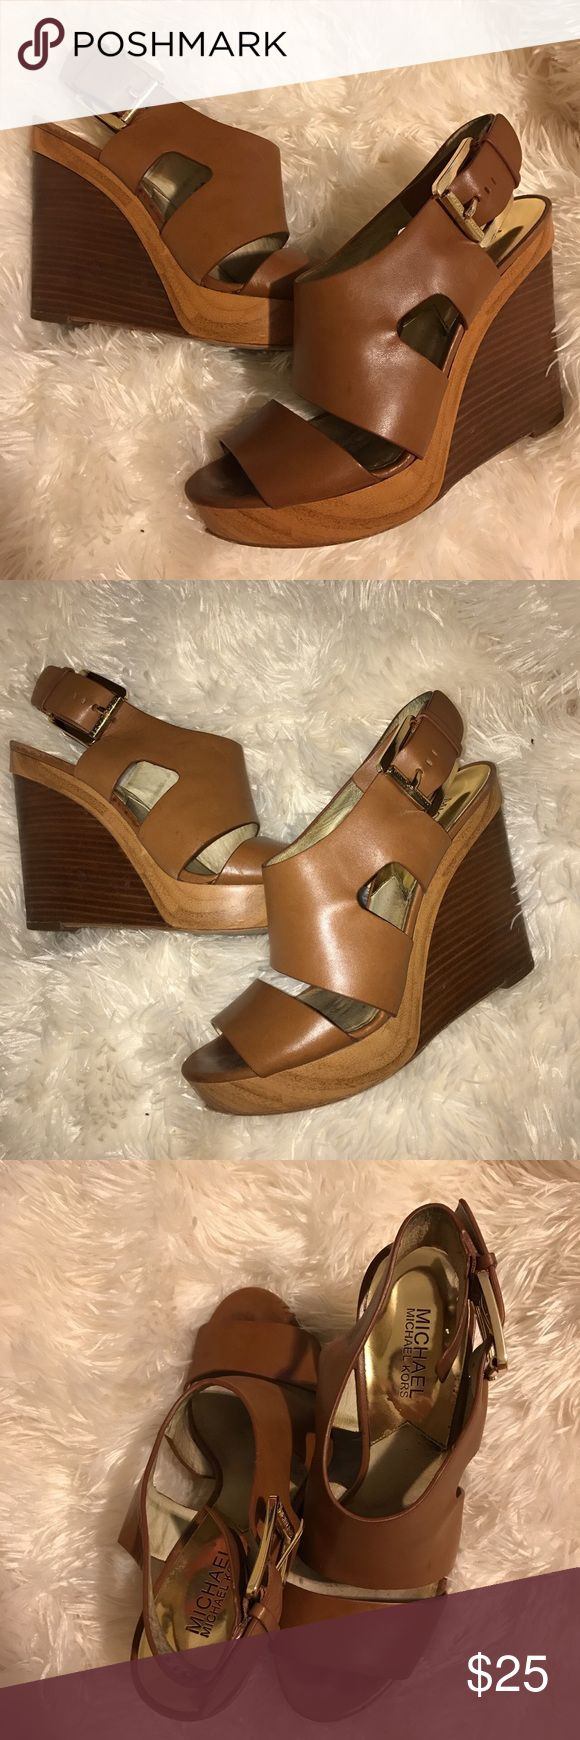 MICHAEL Michael Kors wedge sandals 💗 Neutral wedge sandal by MICHAEL Michael Kors. Perfect for the warm weather. 🌞 MICHAEL Michael Kors Shoes Wedges